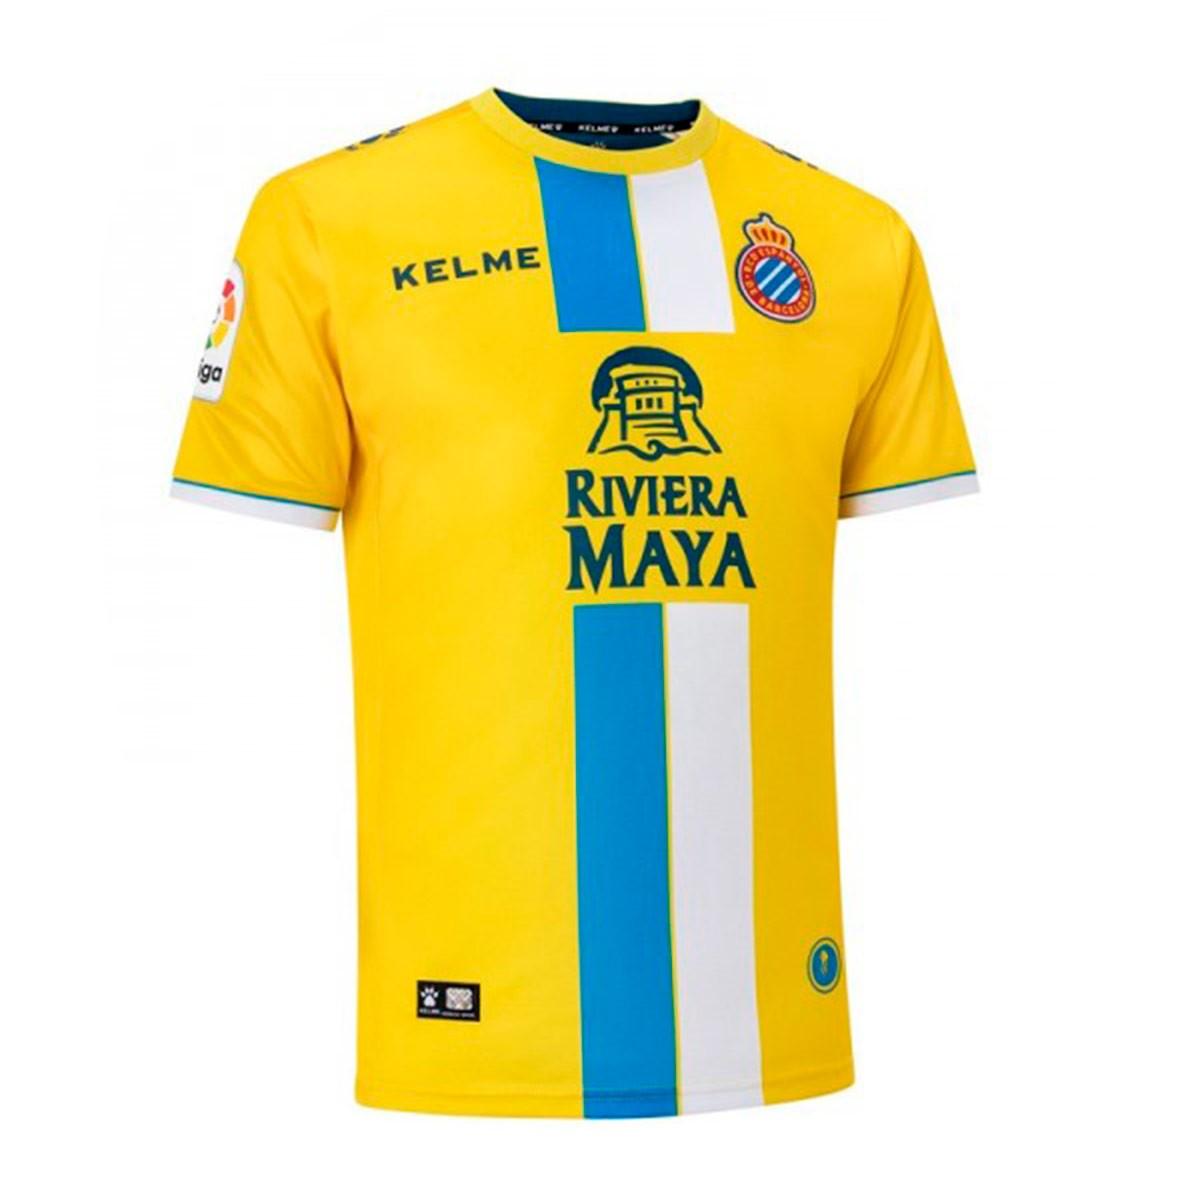 bf38ded18394a Jersey Kelme RCD Espanyol 2018-2019 Third Yellow - Football store ...